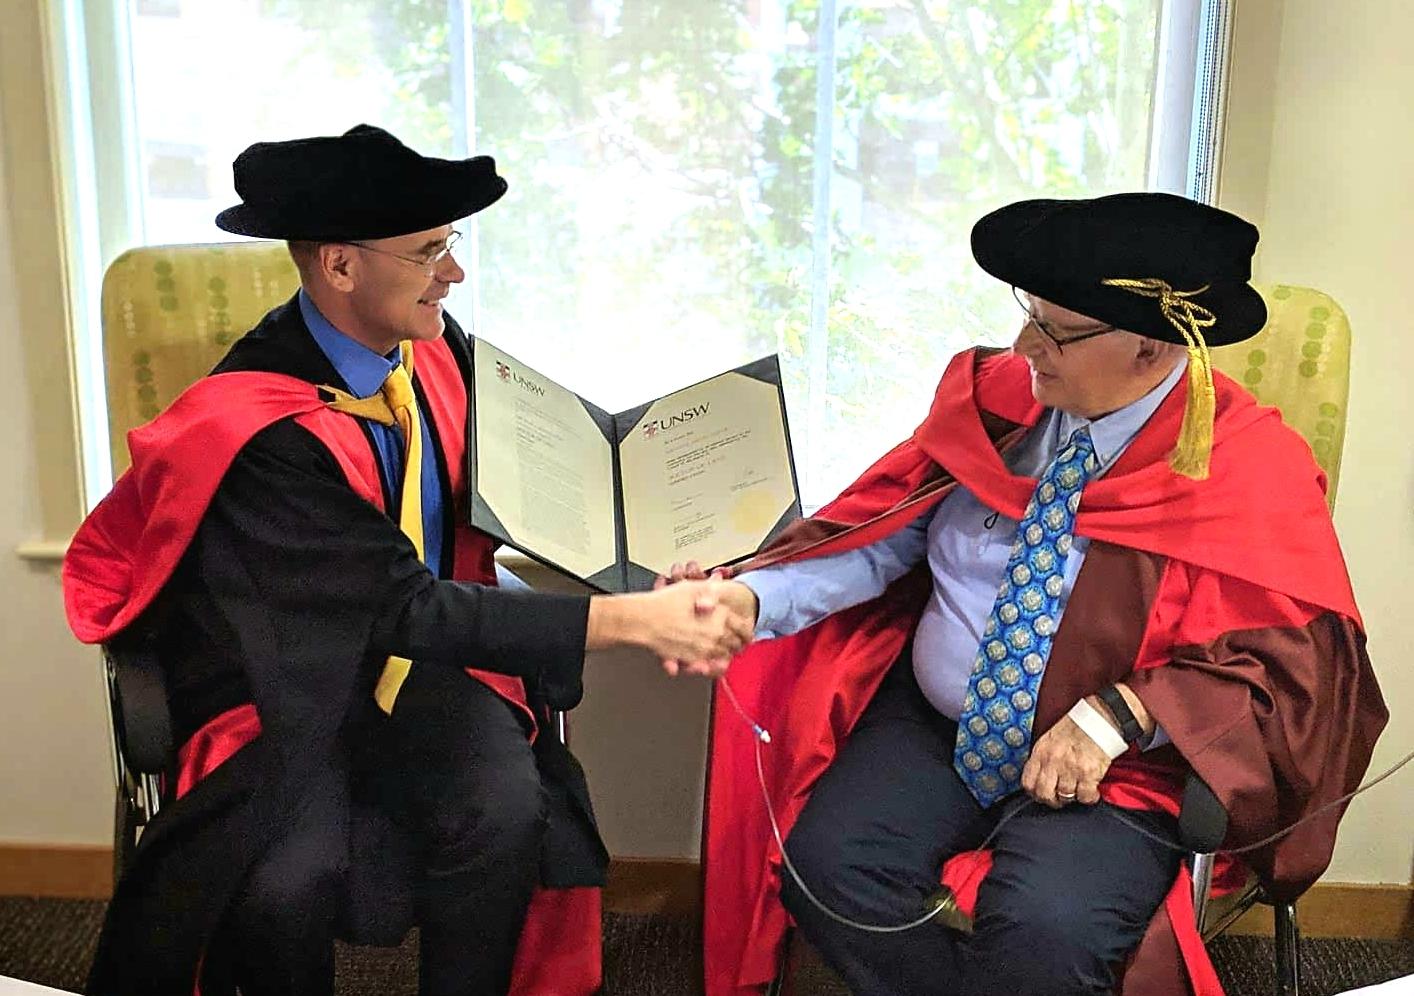 UNSW Dean of Law, Professor George Williams (left) confers the honorary doctorate on Emeritus Professor Michael Coper.